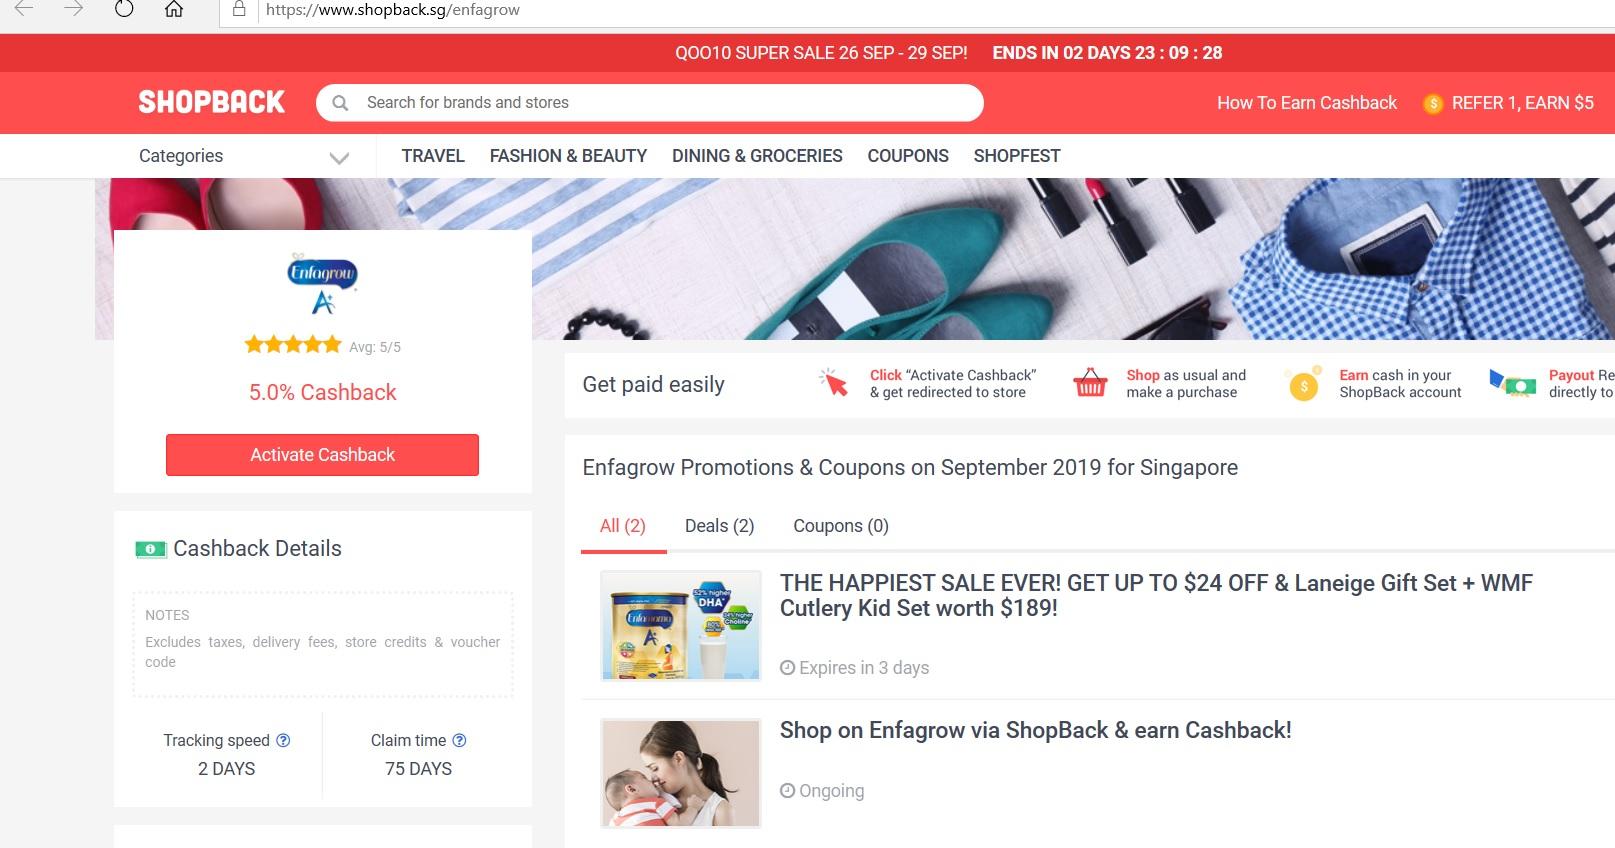 Enfagrow page on the ShopBack website.